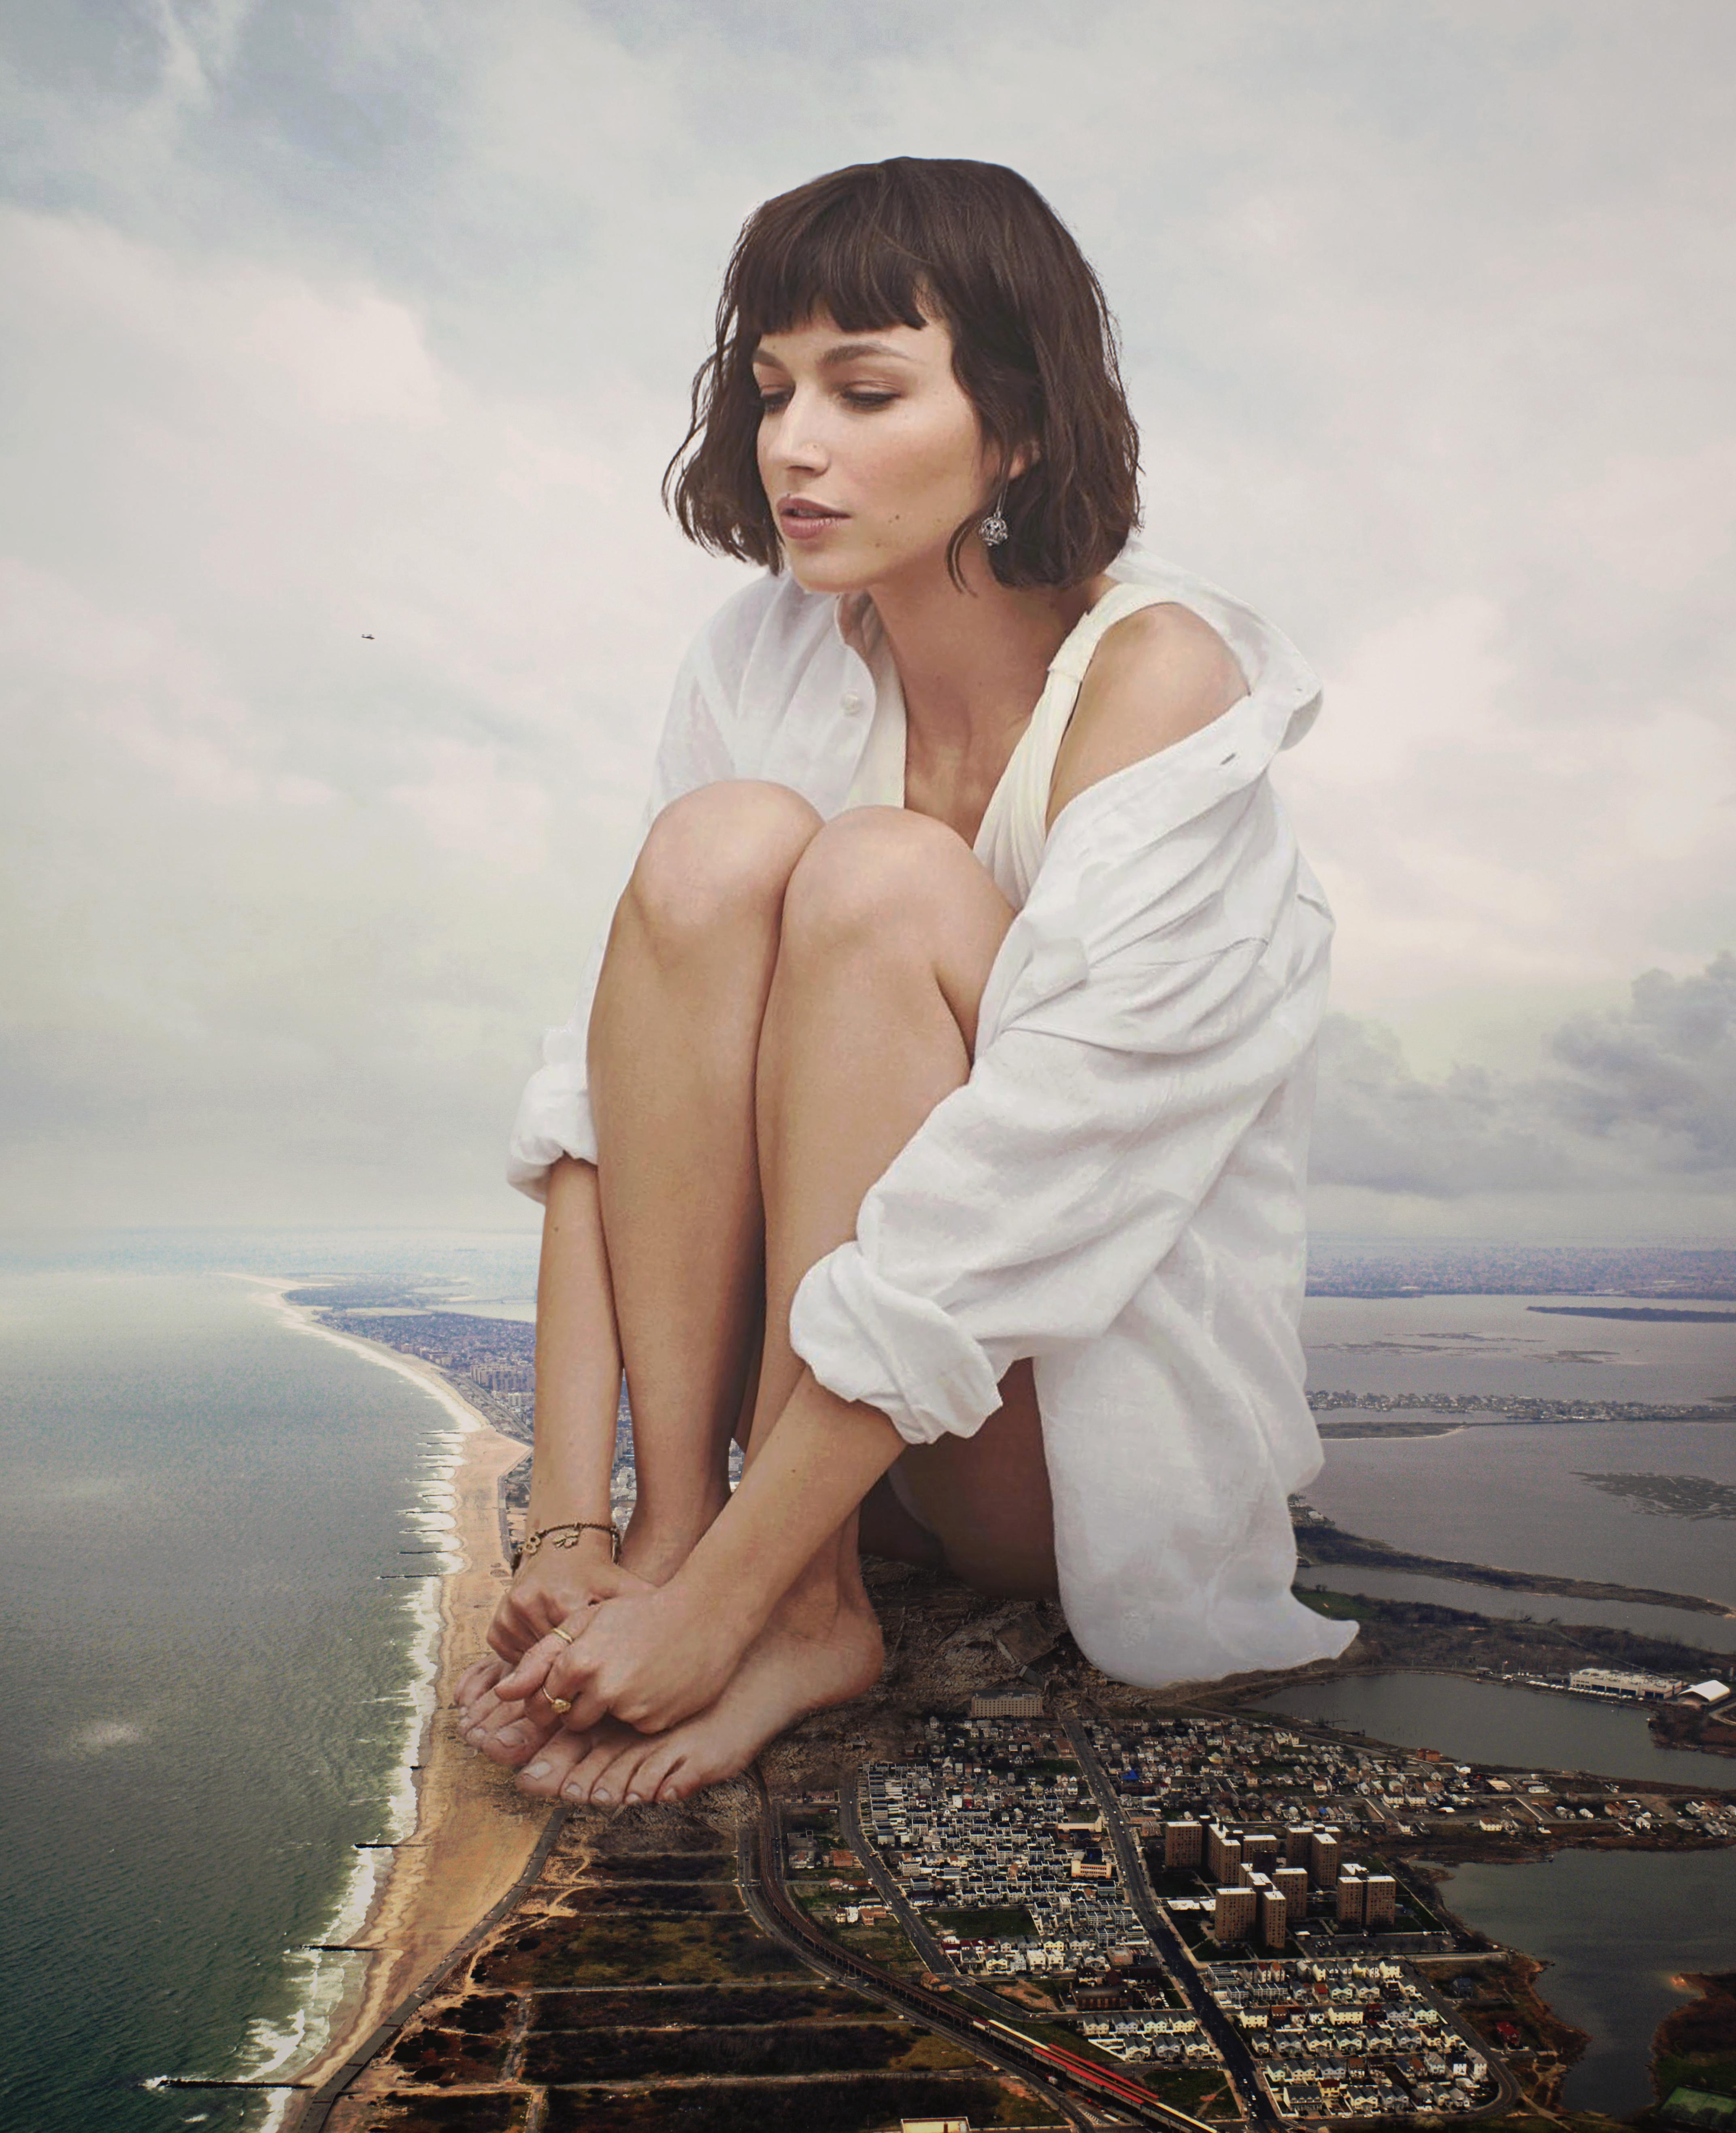 Feet úrsula corberó Ursula Corbero: